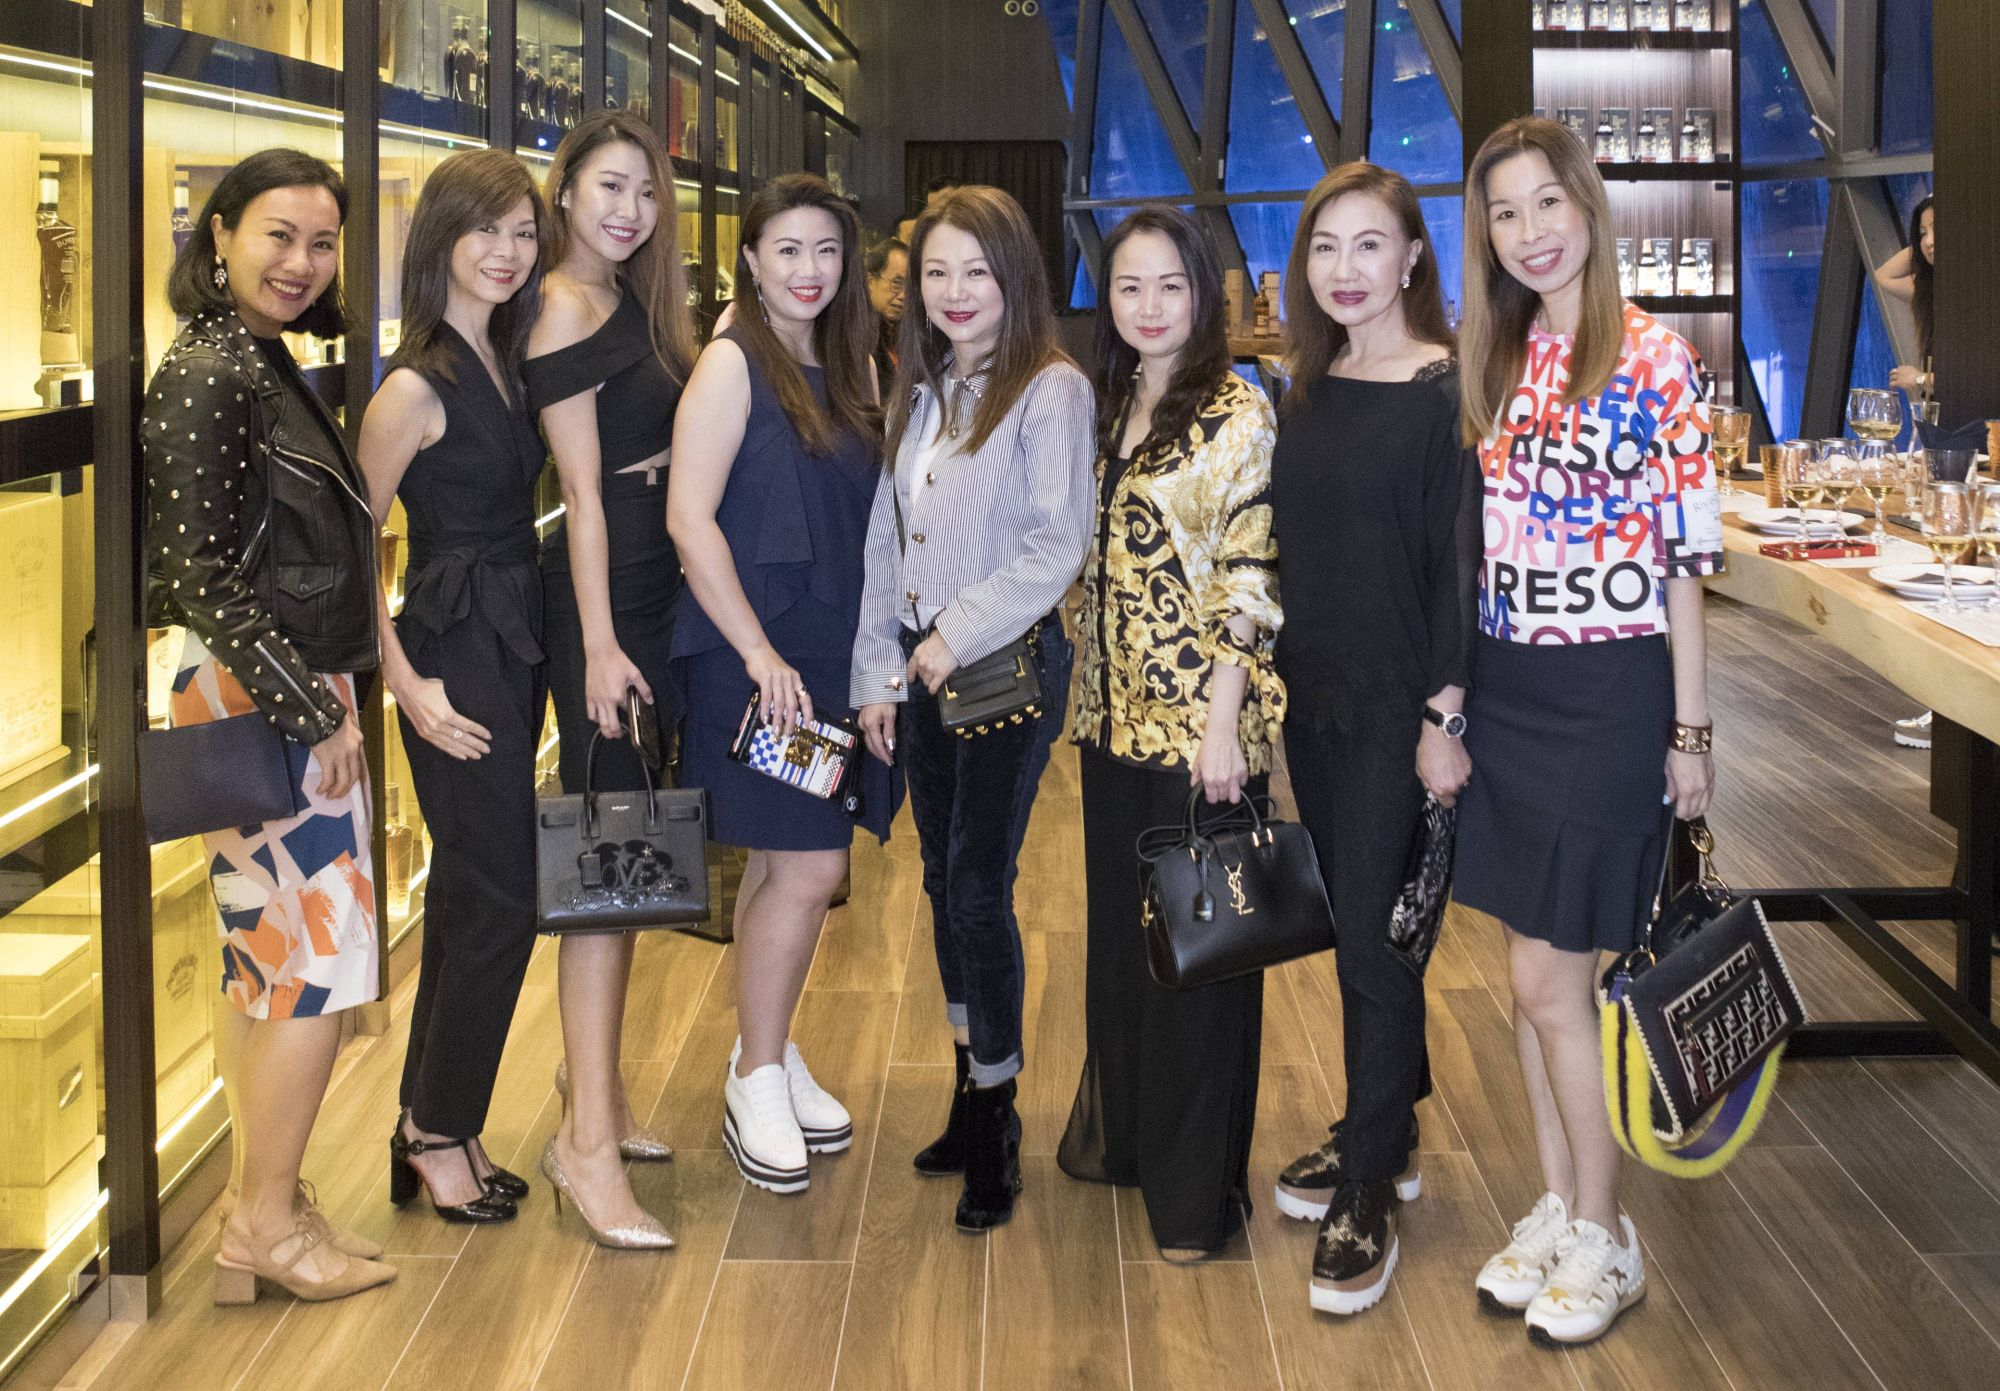 Karen Ang, Dolly Cheong, Symone Oei, Siow Yin Yin, Angela Ng, Tanya Tan, Maria See, Stephanie Tay